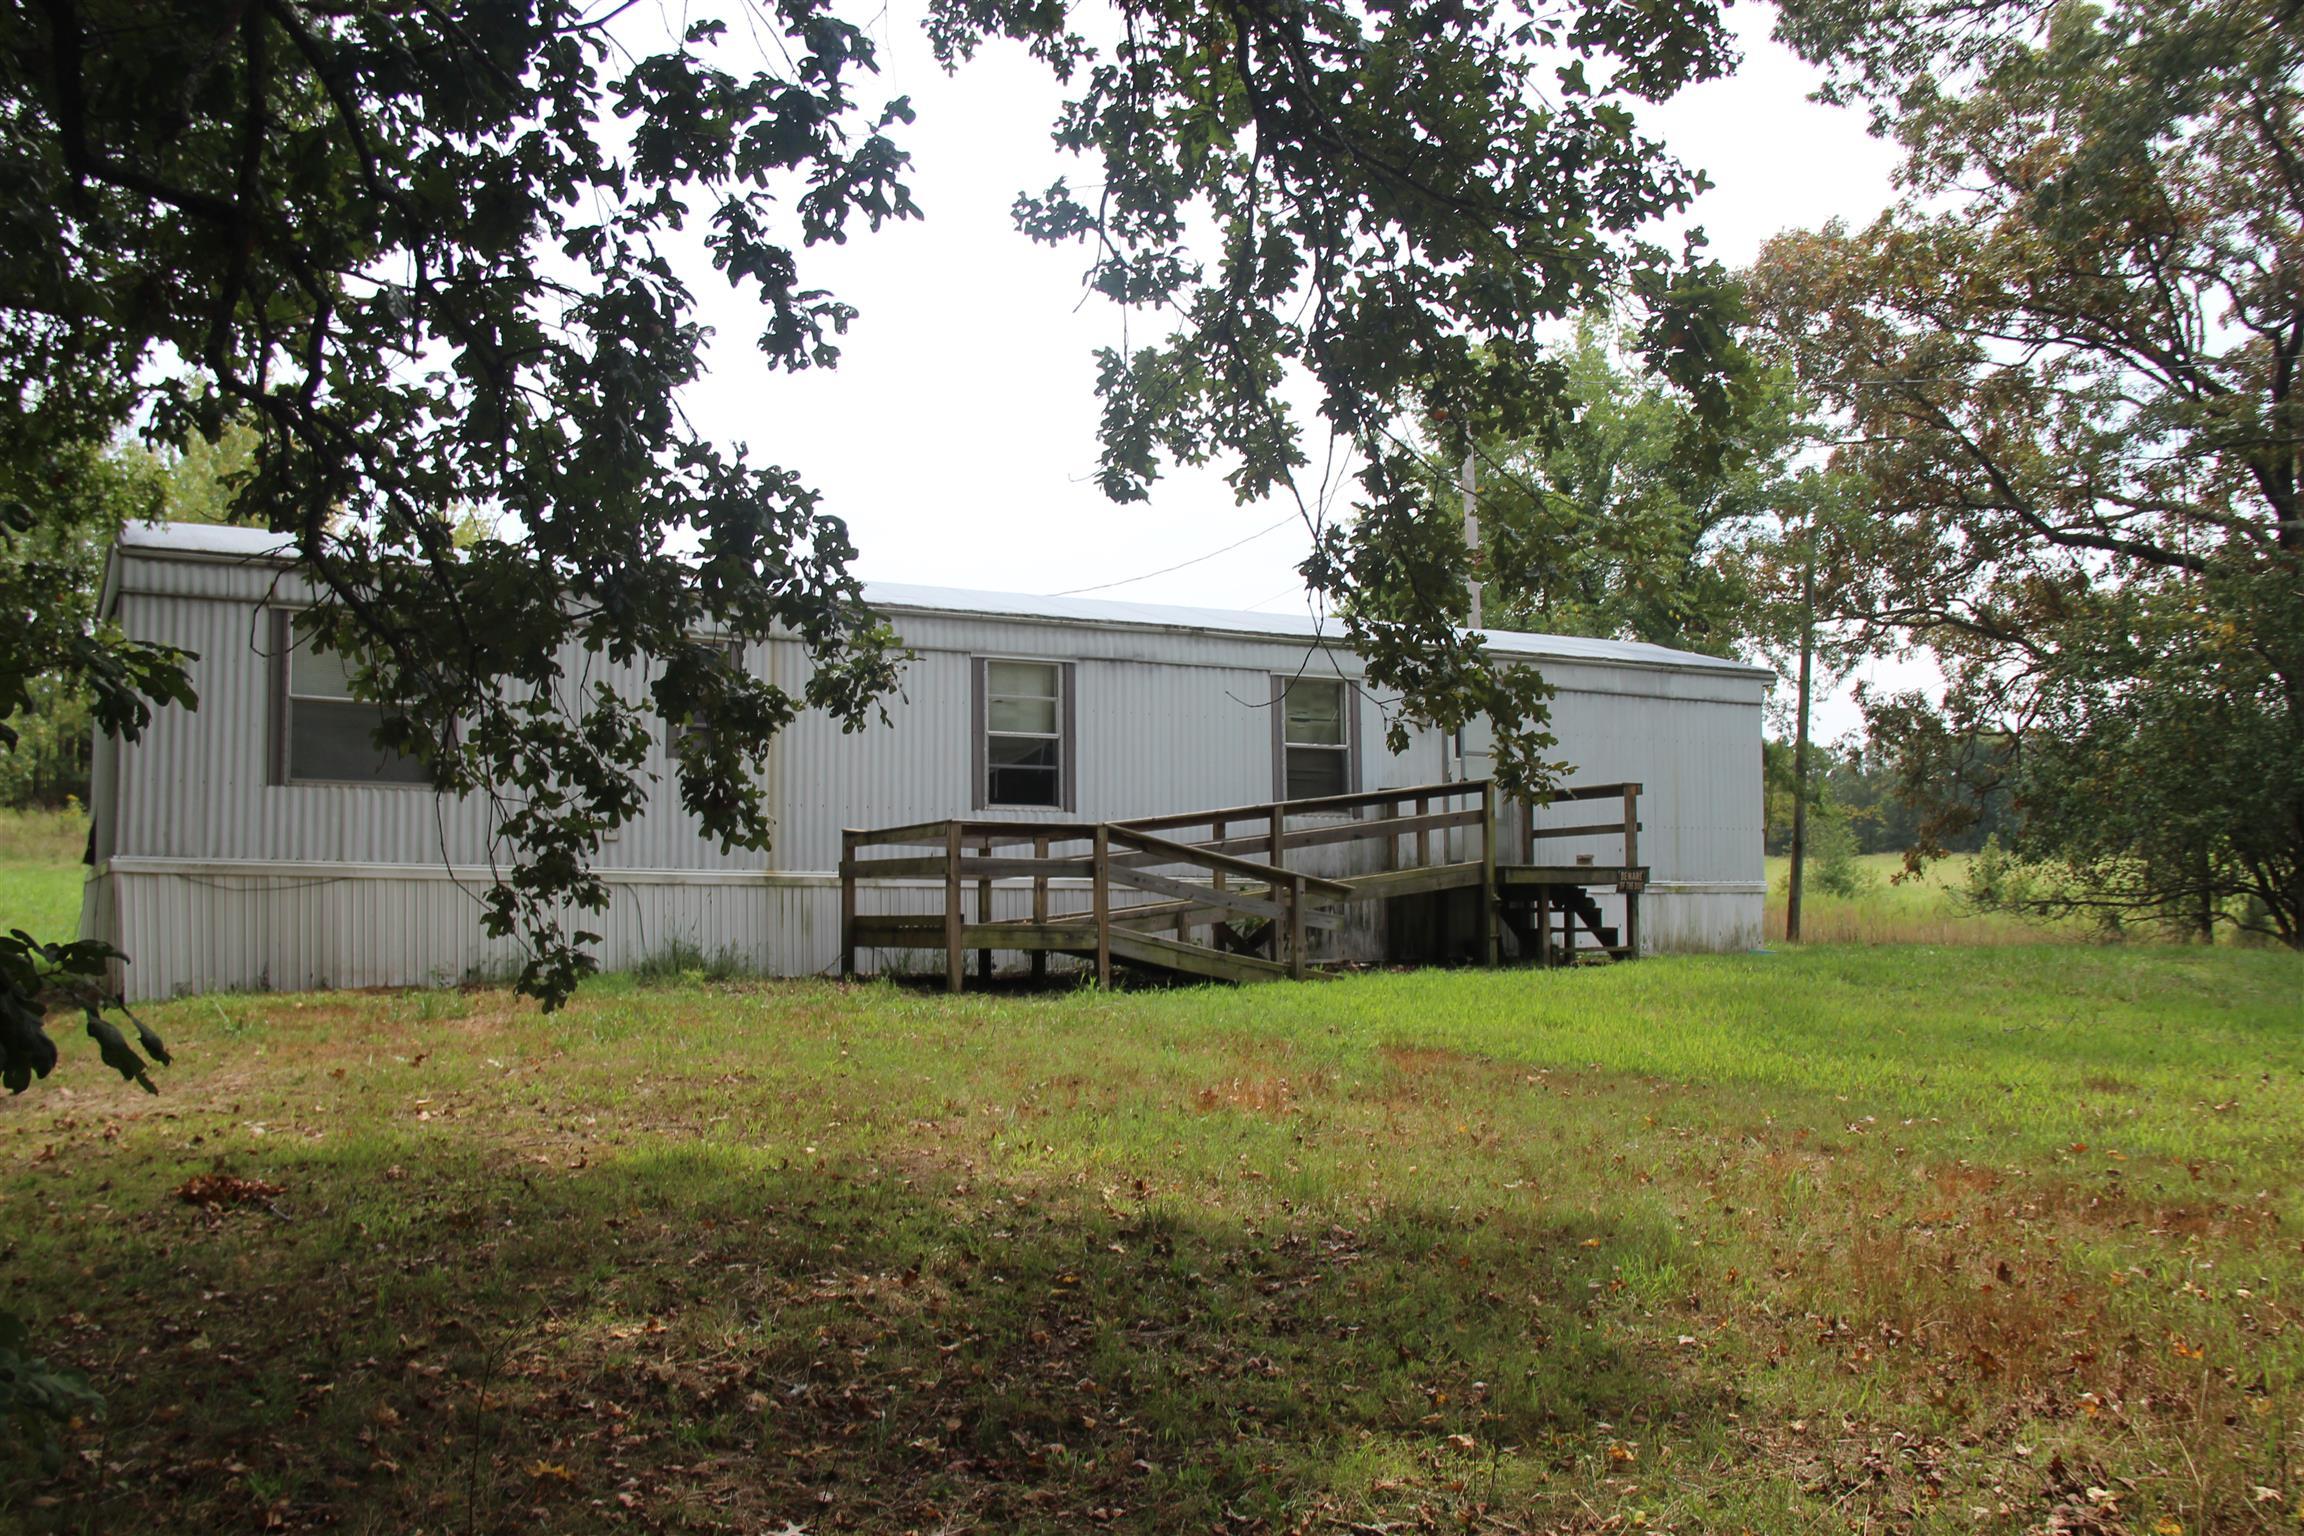 4837 Highway 49, S, Tennessee Ridge, TN 37178 - Tennessee Ridge, TN real estate listing